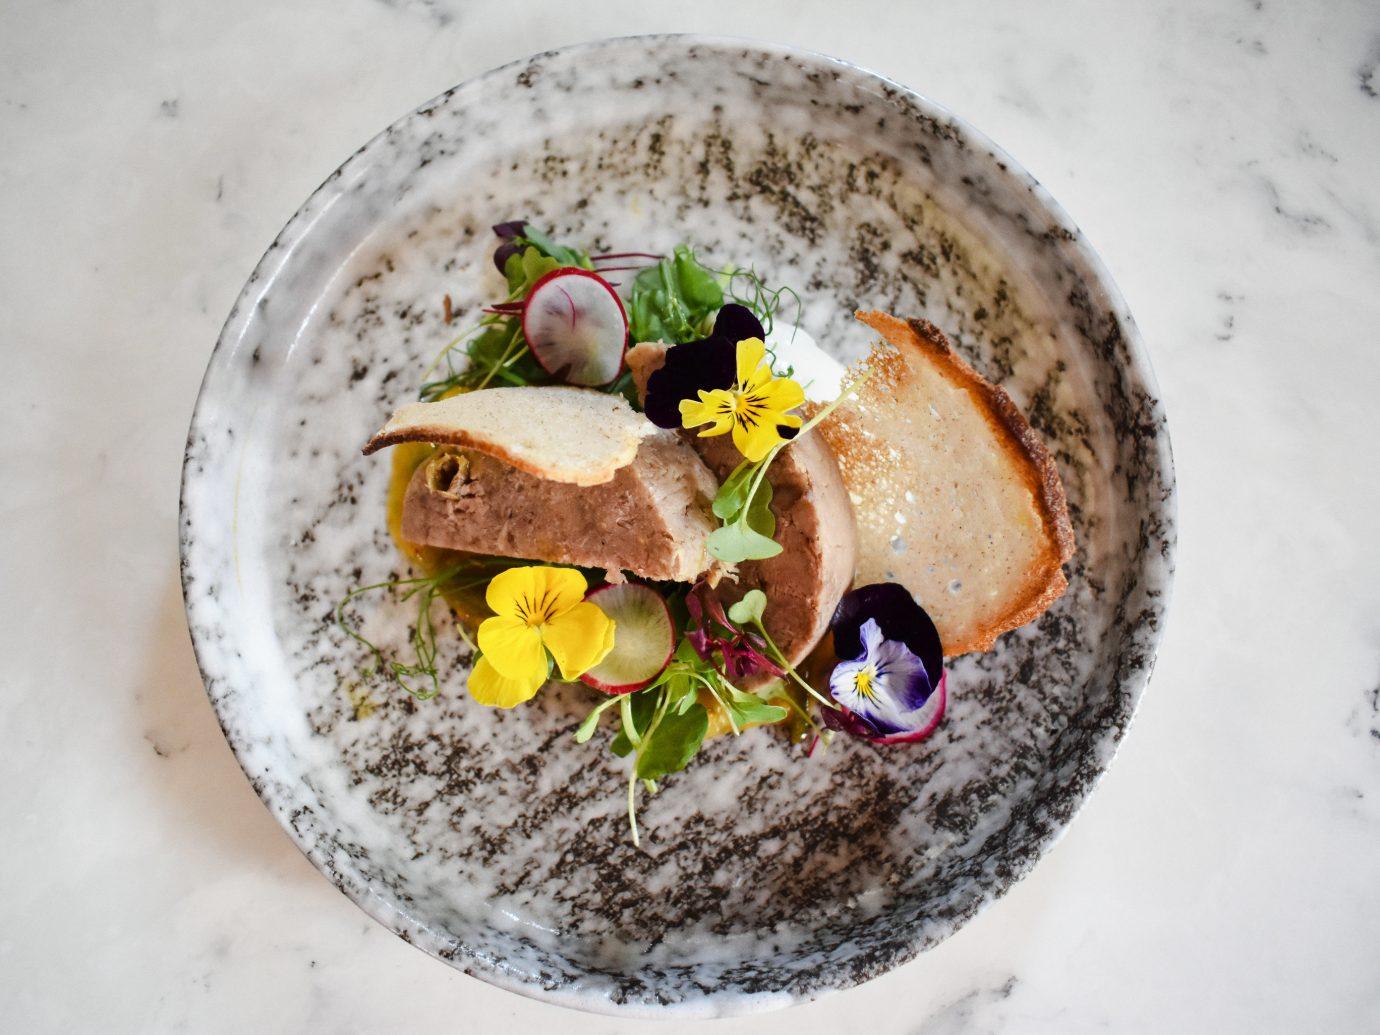 Edinburgh Hotels Jetsetter Guides Scotland Travel Tips Trip Ideas food dish dessert cuisine recipe